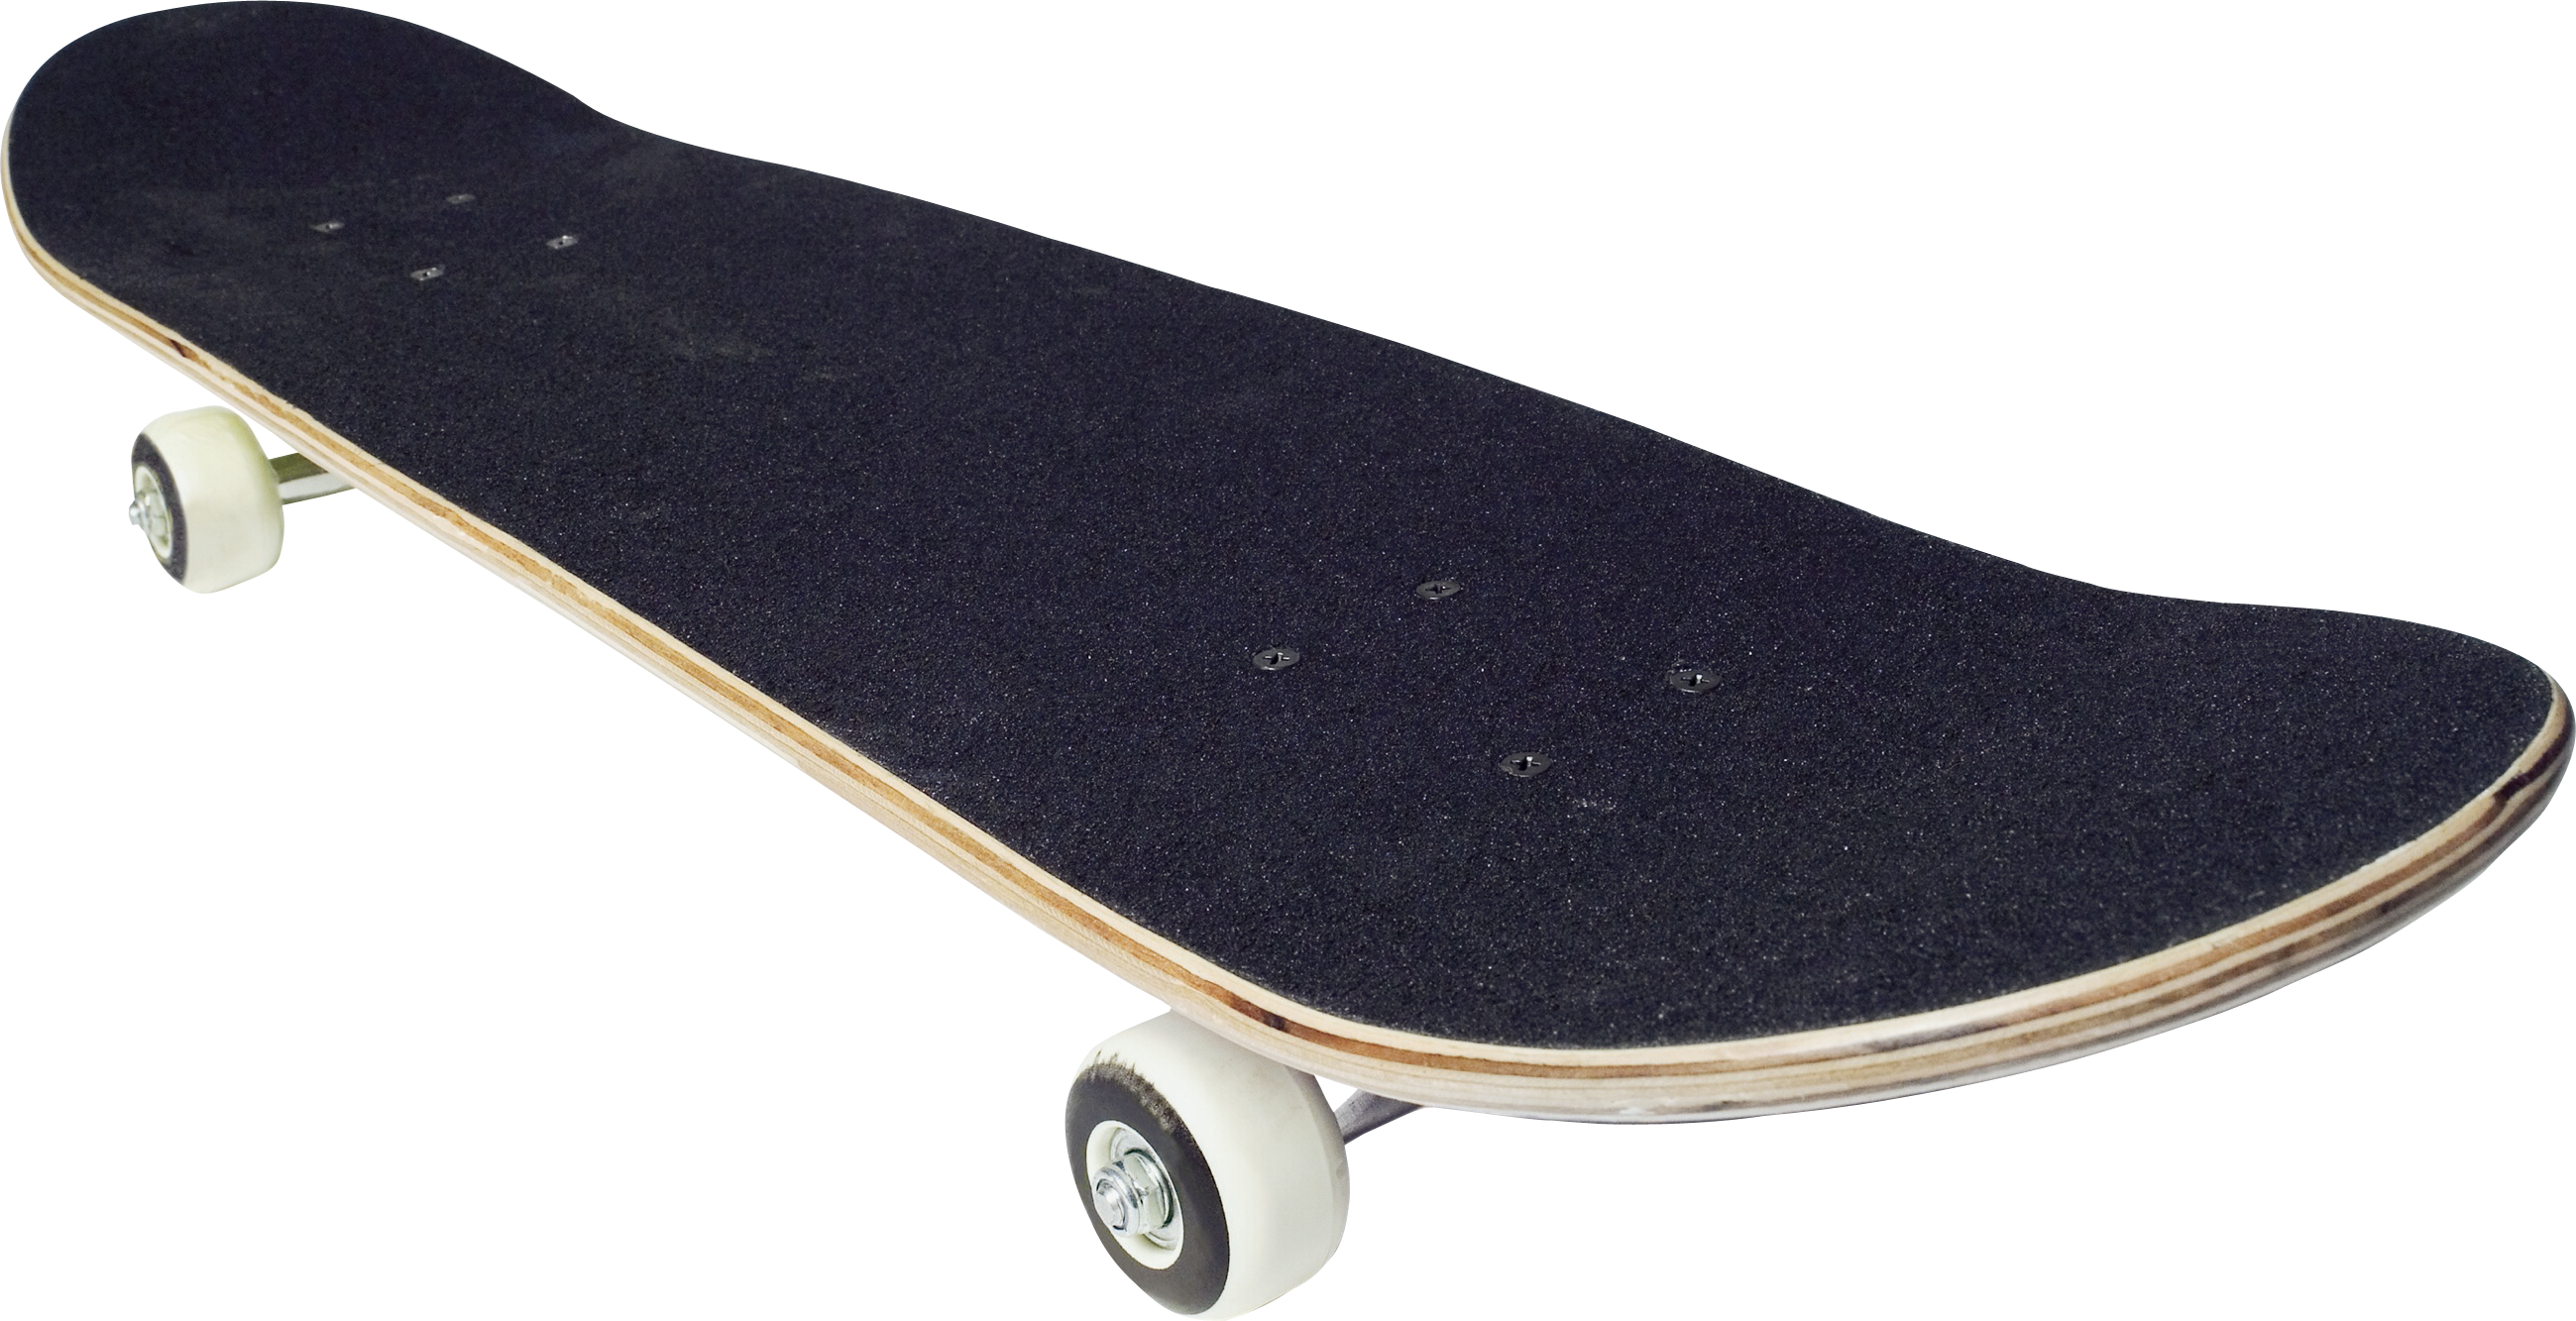 картинка скейта без фона видят, кроме своего